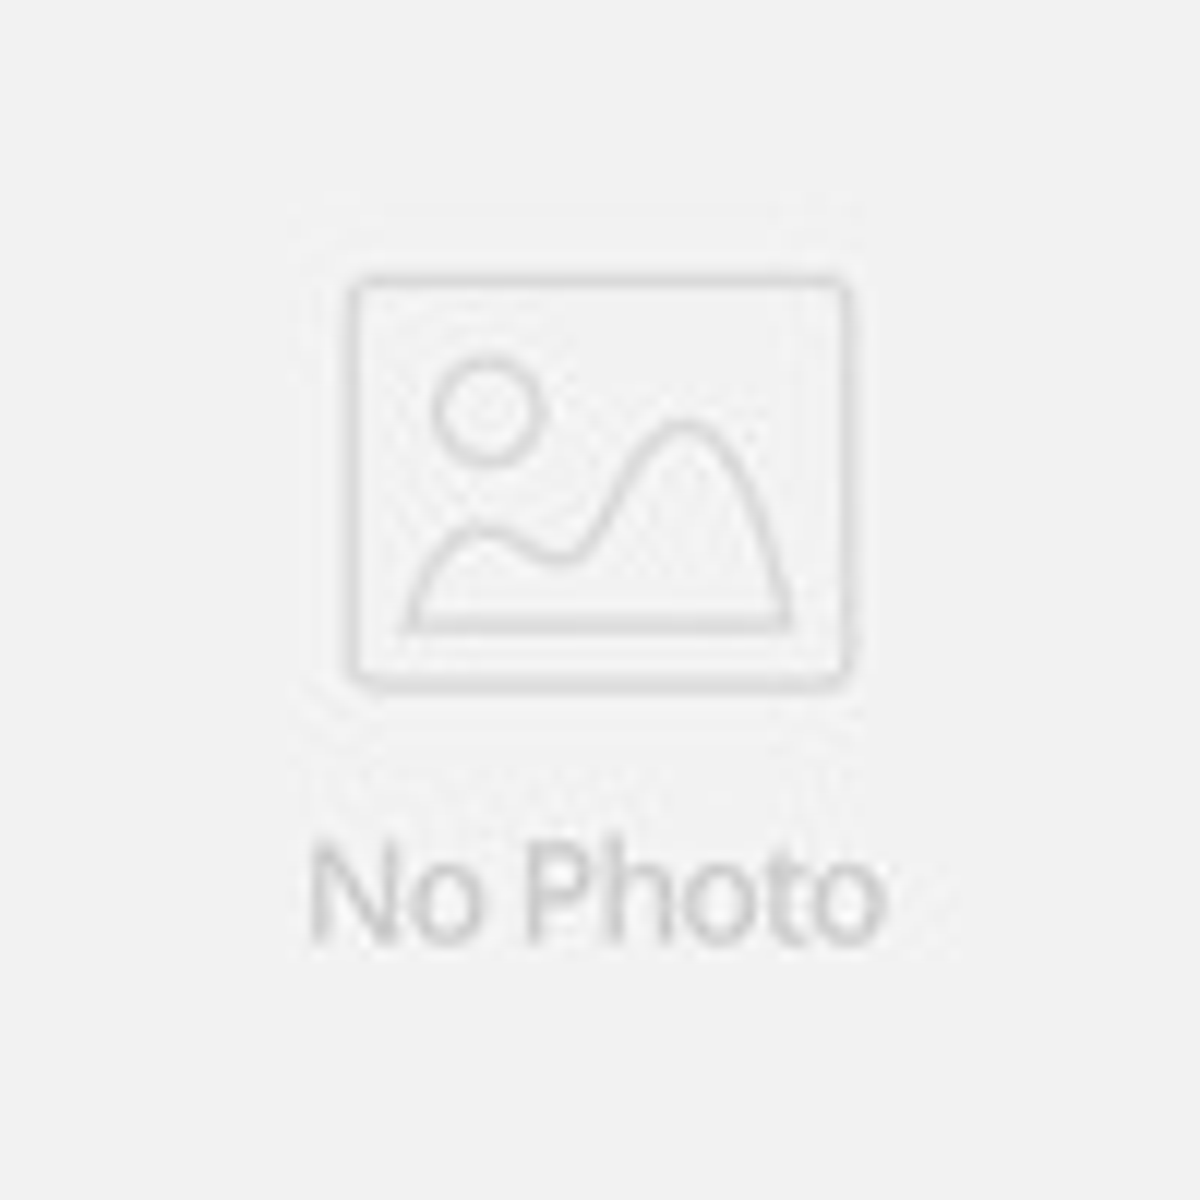 Гаджет  Best Promotion Magnetic Auto Slim Sleep PU Leather Stand Case Cover Skin Protector For Kobo Glo Screen protecting film None Компьютер & сеть